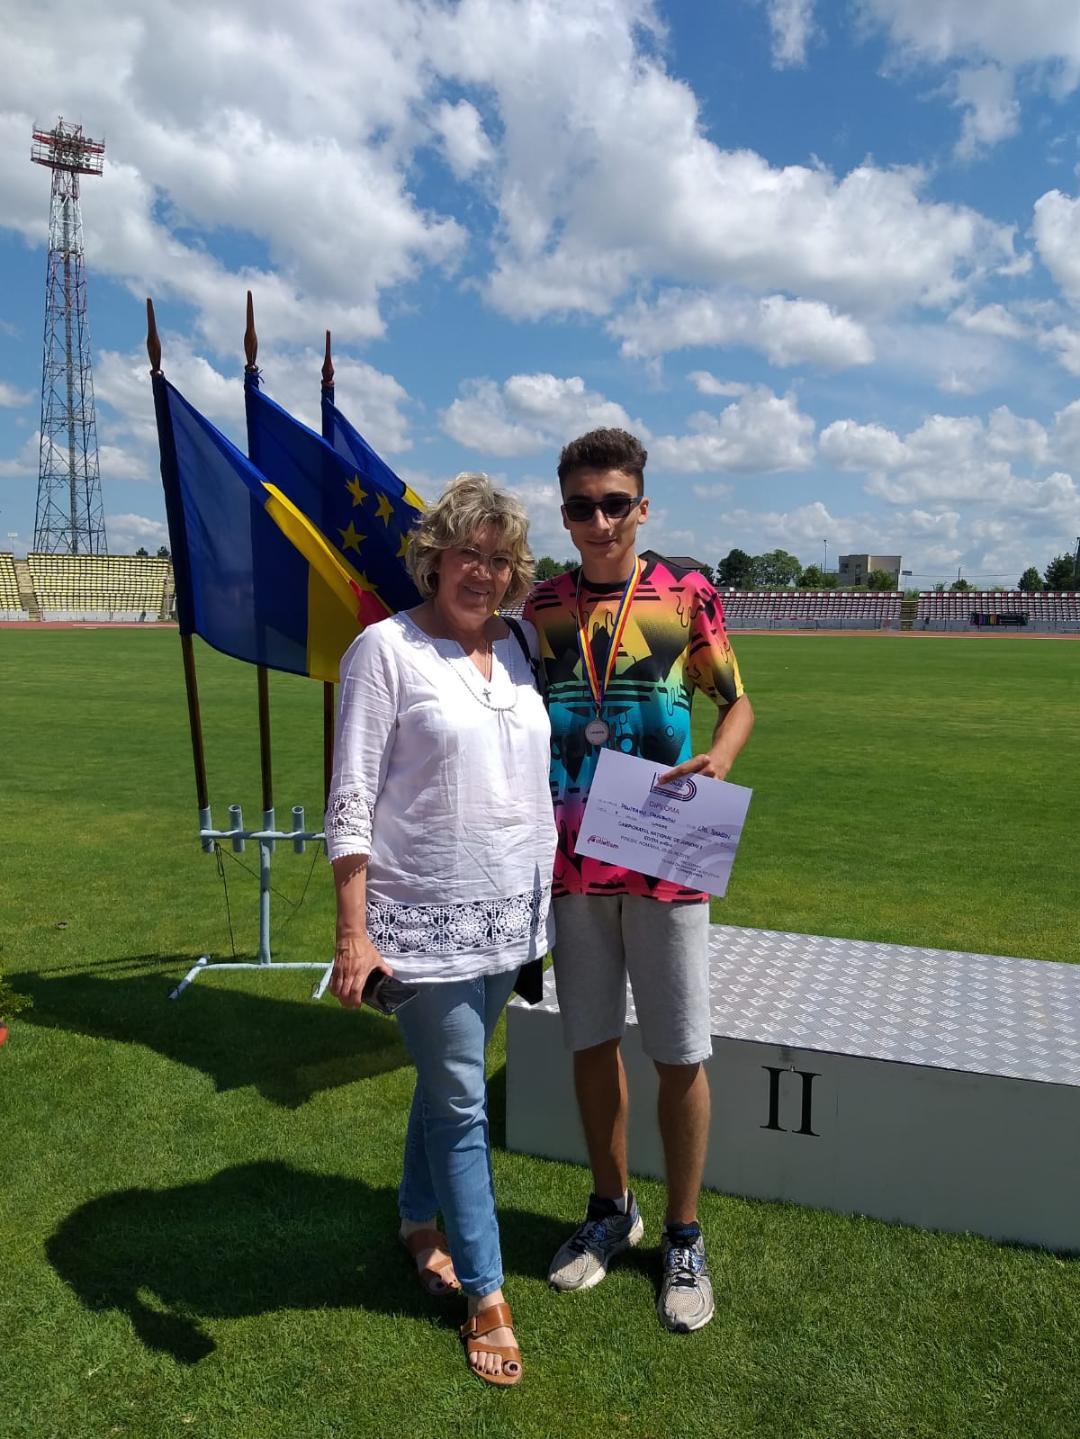 Raul Pruteanu Vicecampion atletism (4)